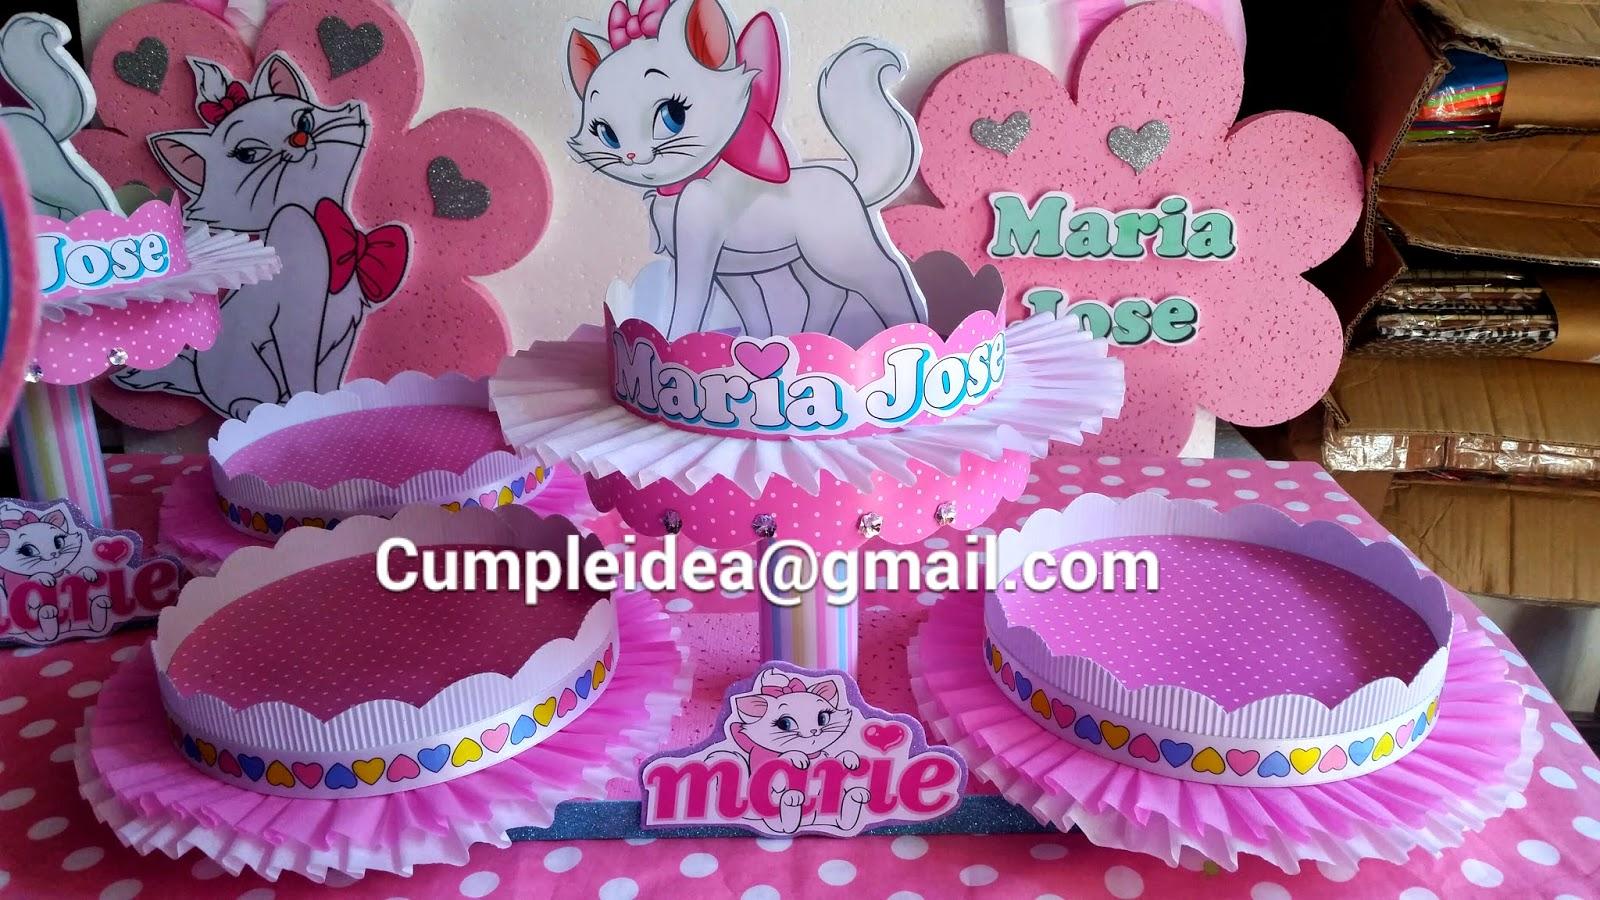 Decoraciones infantiles gatita marie - Decoraciones para cumpleanos infantiles ...